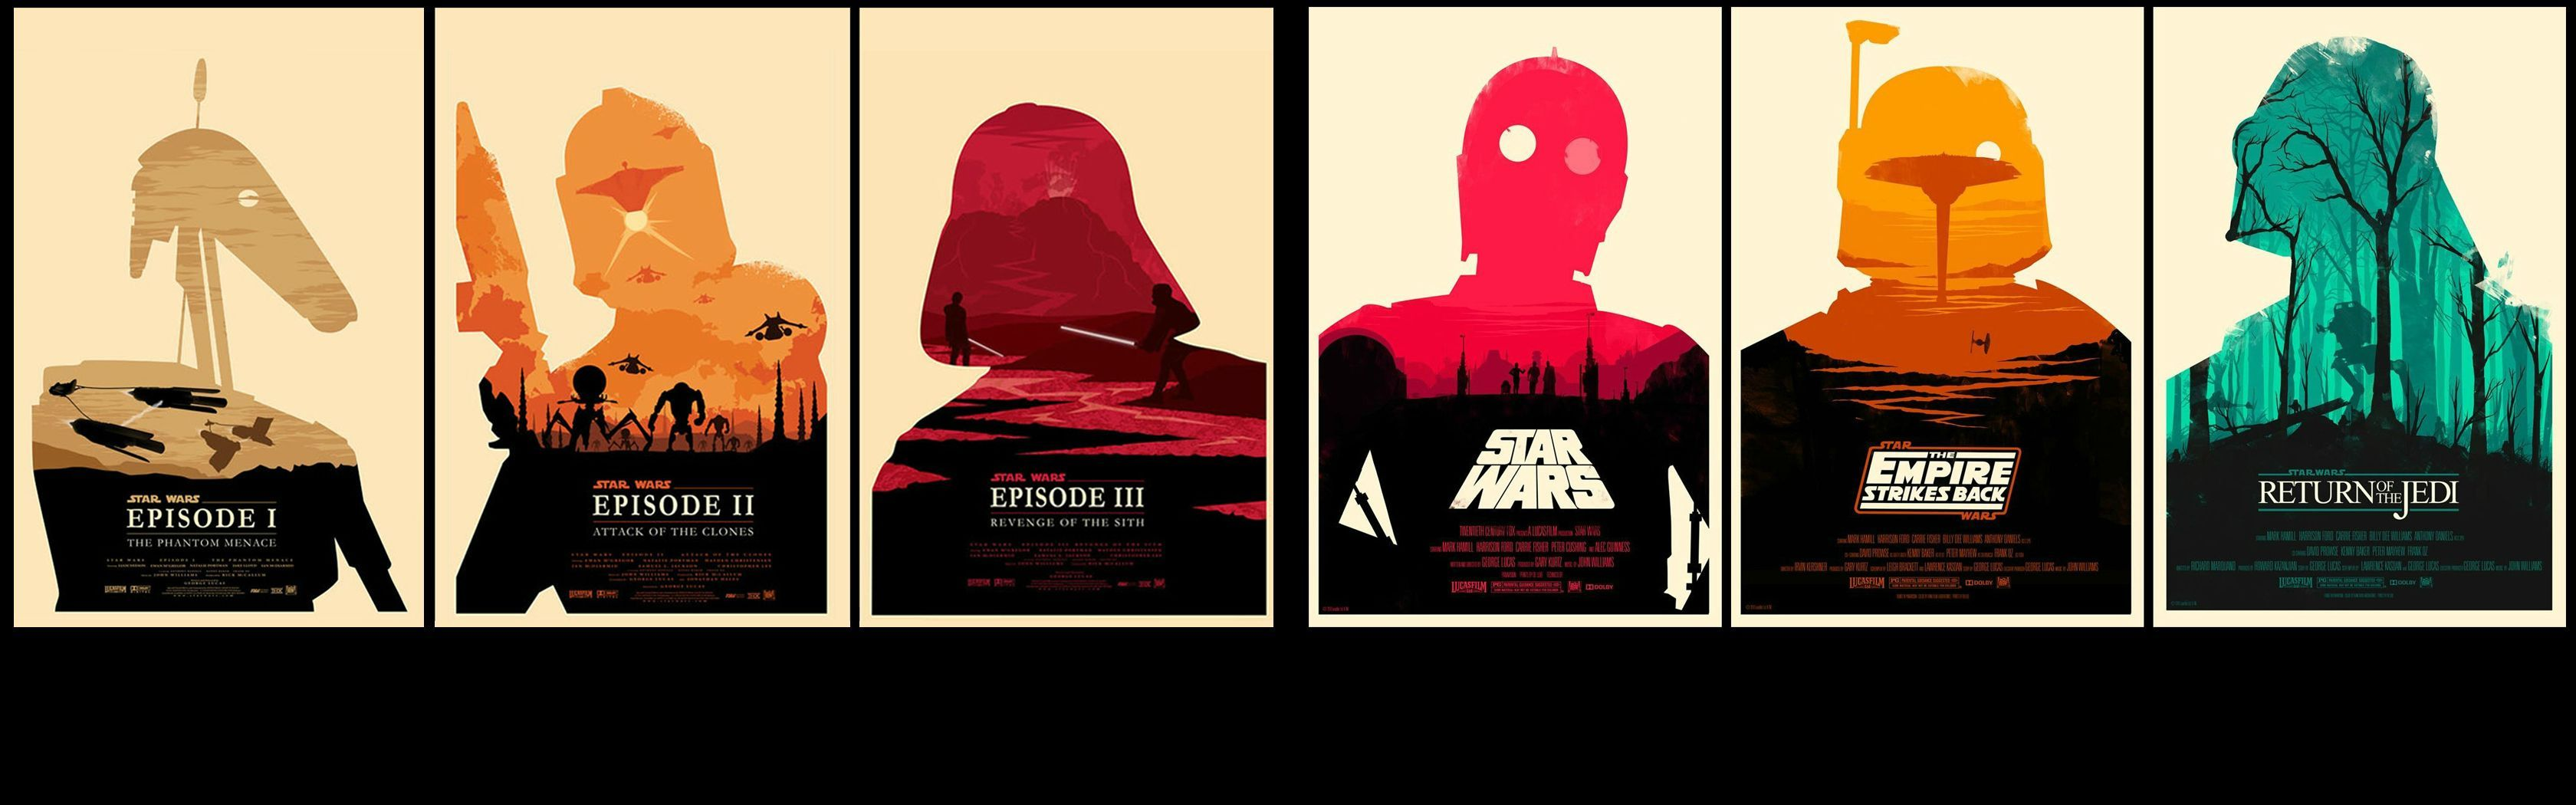 Star Wars Logo Dual Screen Wallpapers Top Free Star Wars Logo Dual Screen Backgrounds Wallpaperaccess